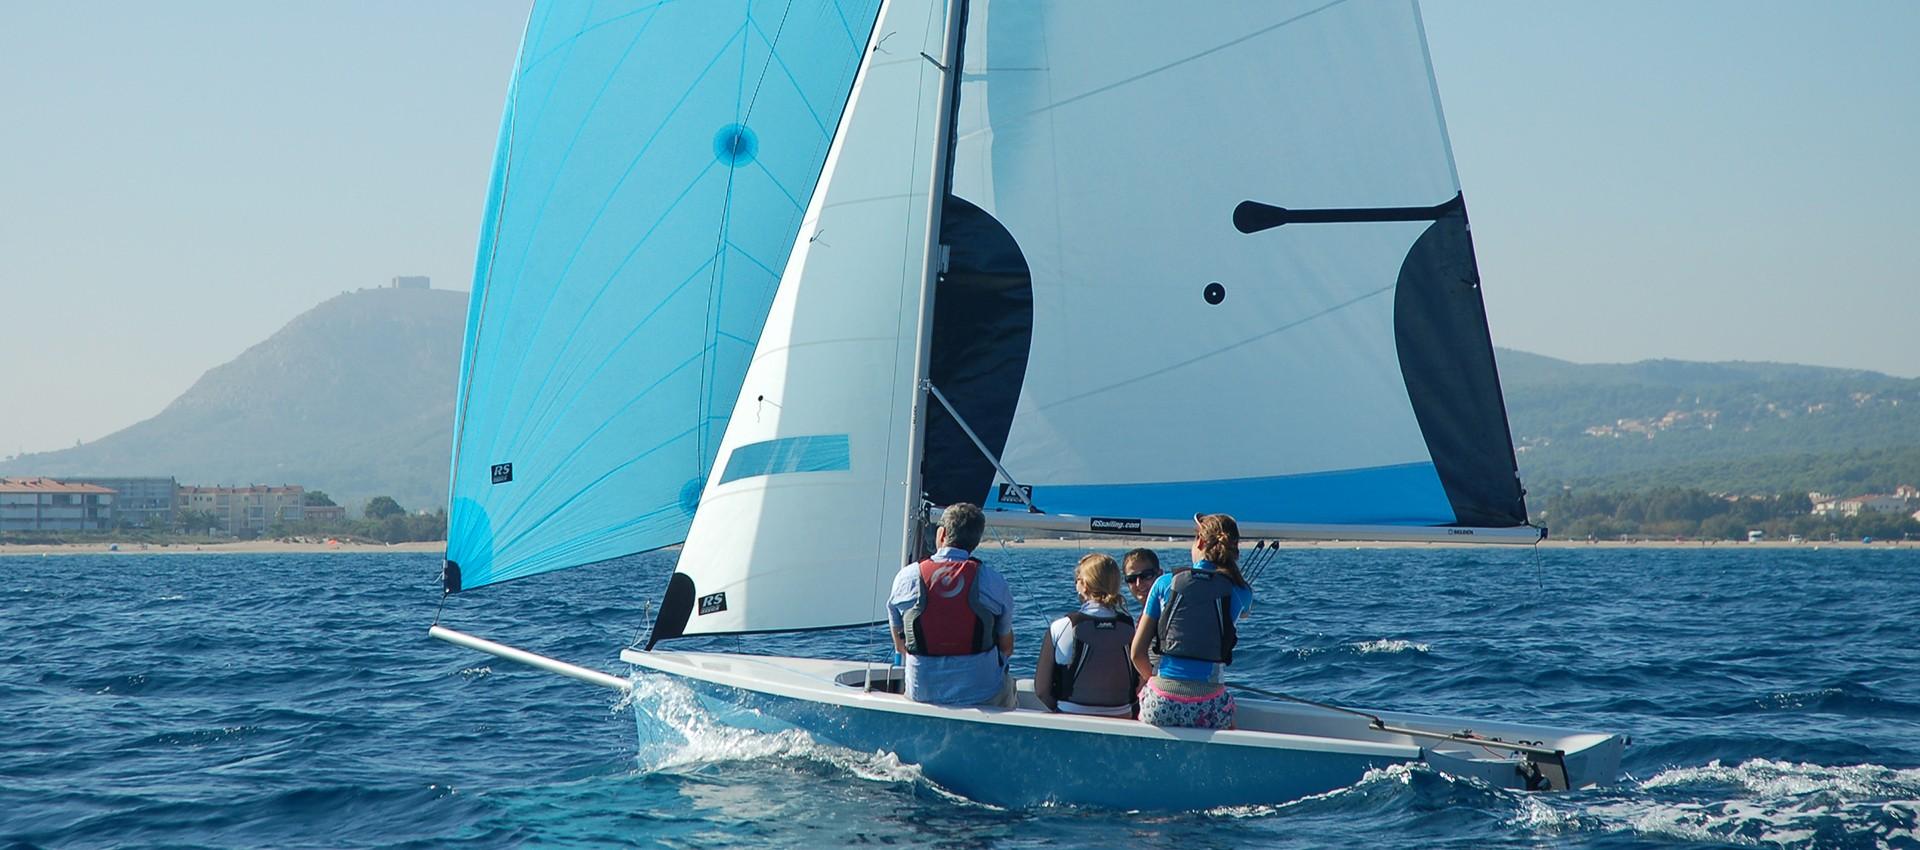 La aventura de navegar